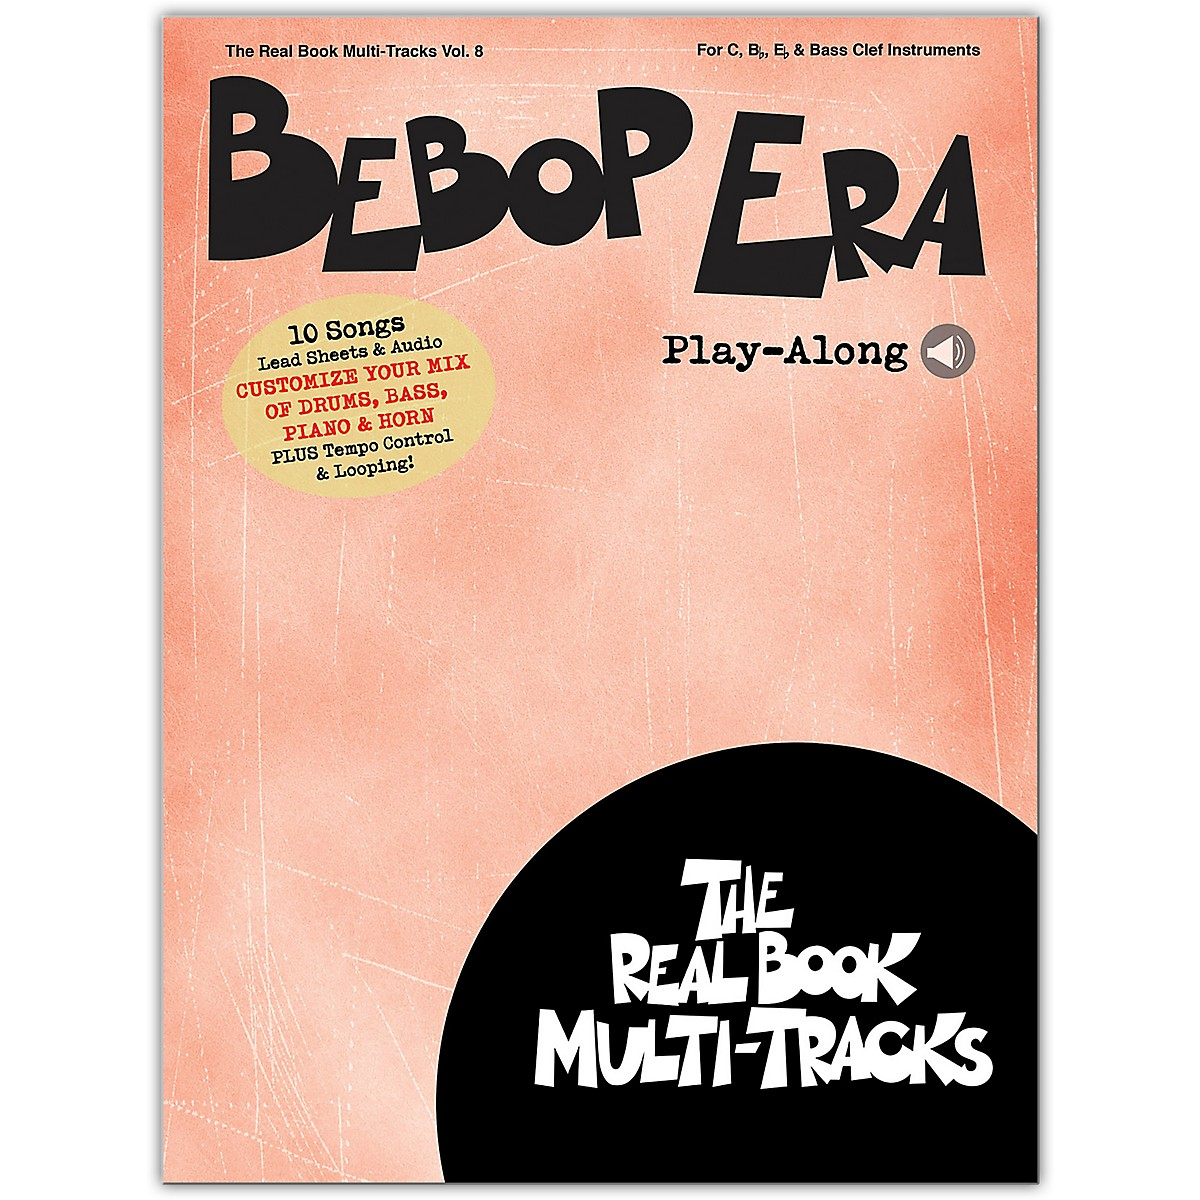 Hal Leonard Bebop Era Play-Along  Real Book Multi-Tracks Volume 8 Book/Audio Online